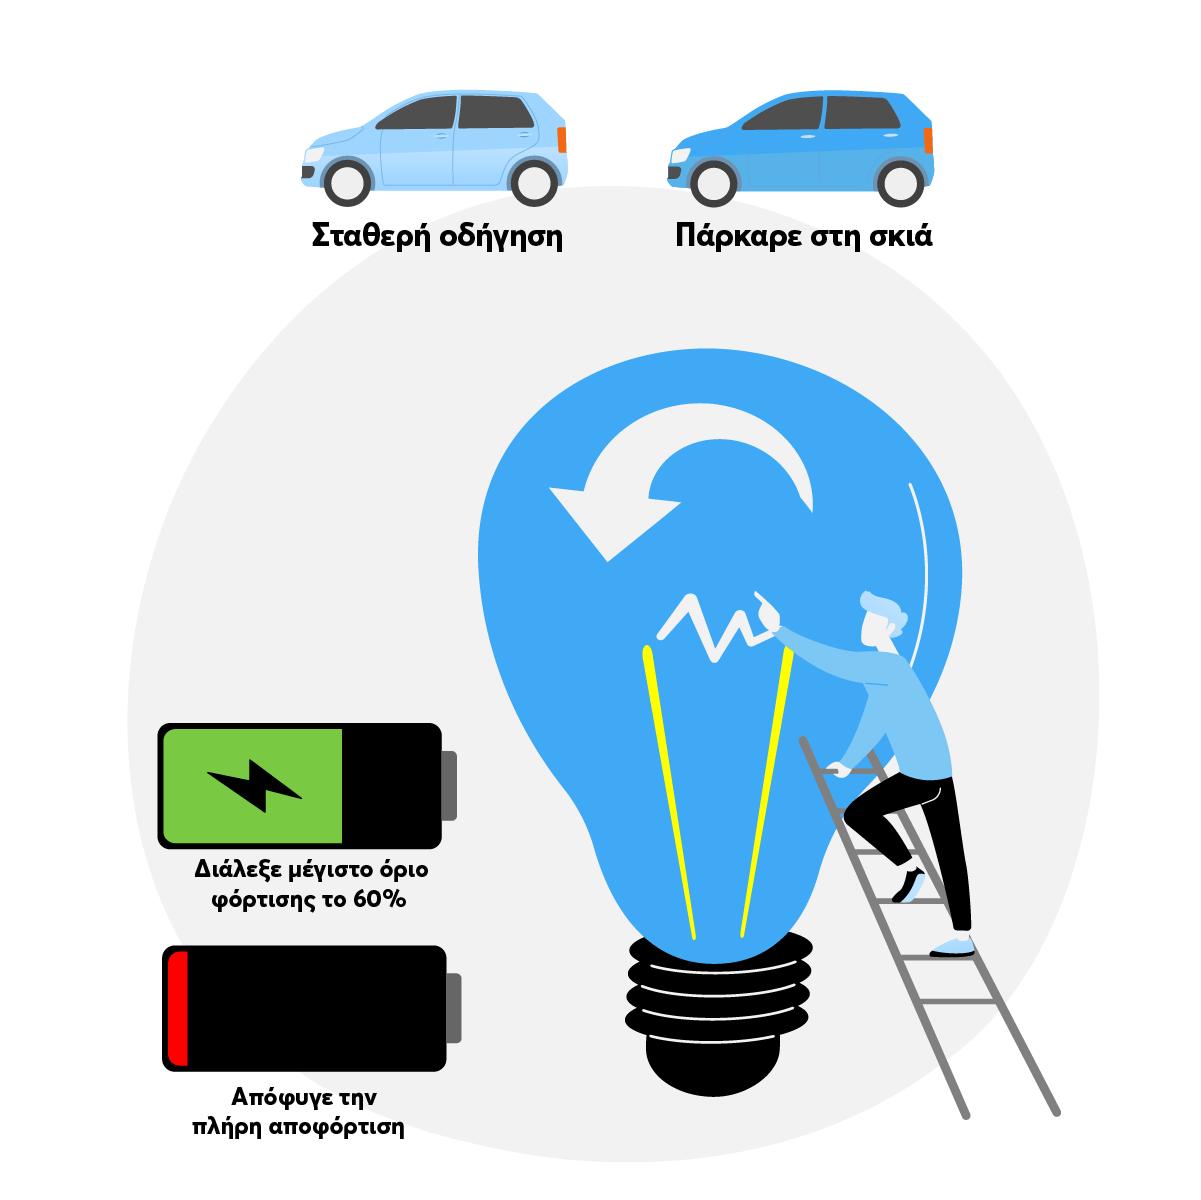 design με συμβουλές για να κρατήσει περισσότερο η μπαταρία